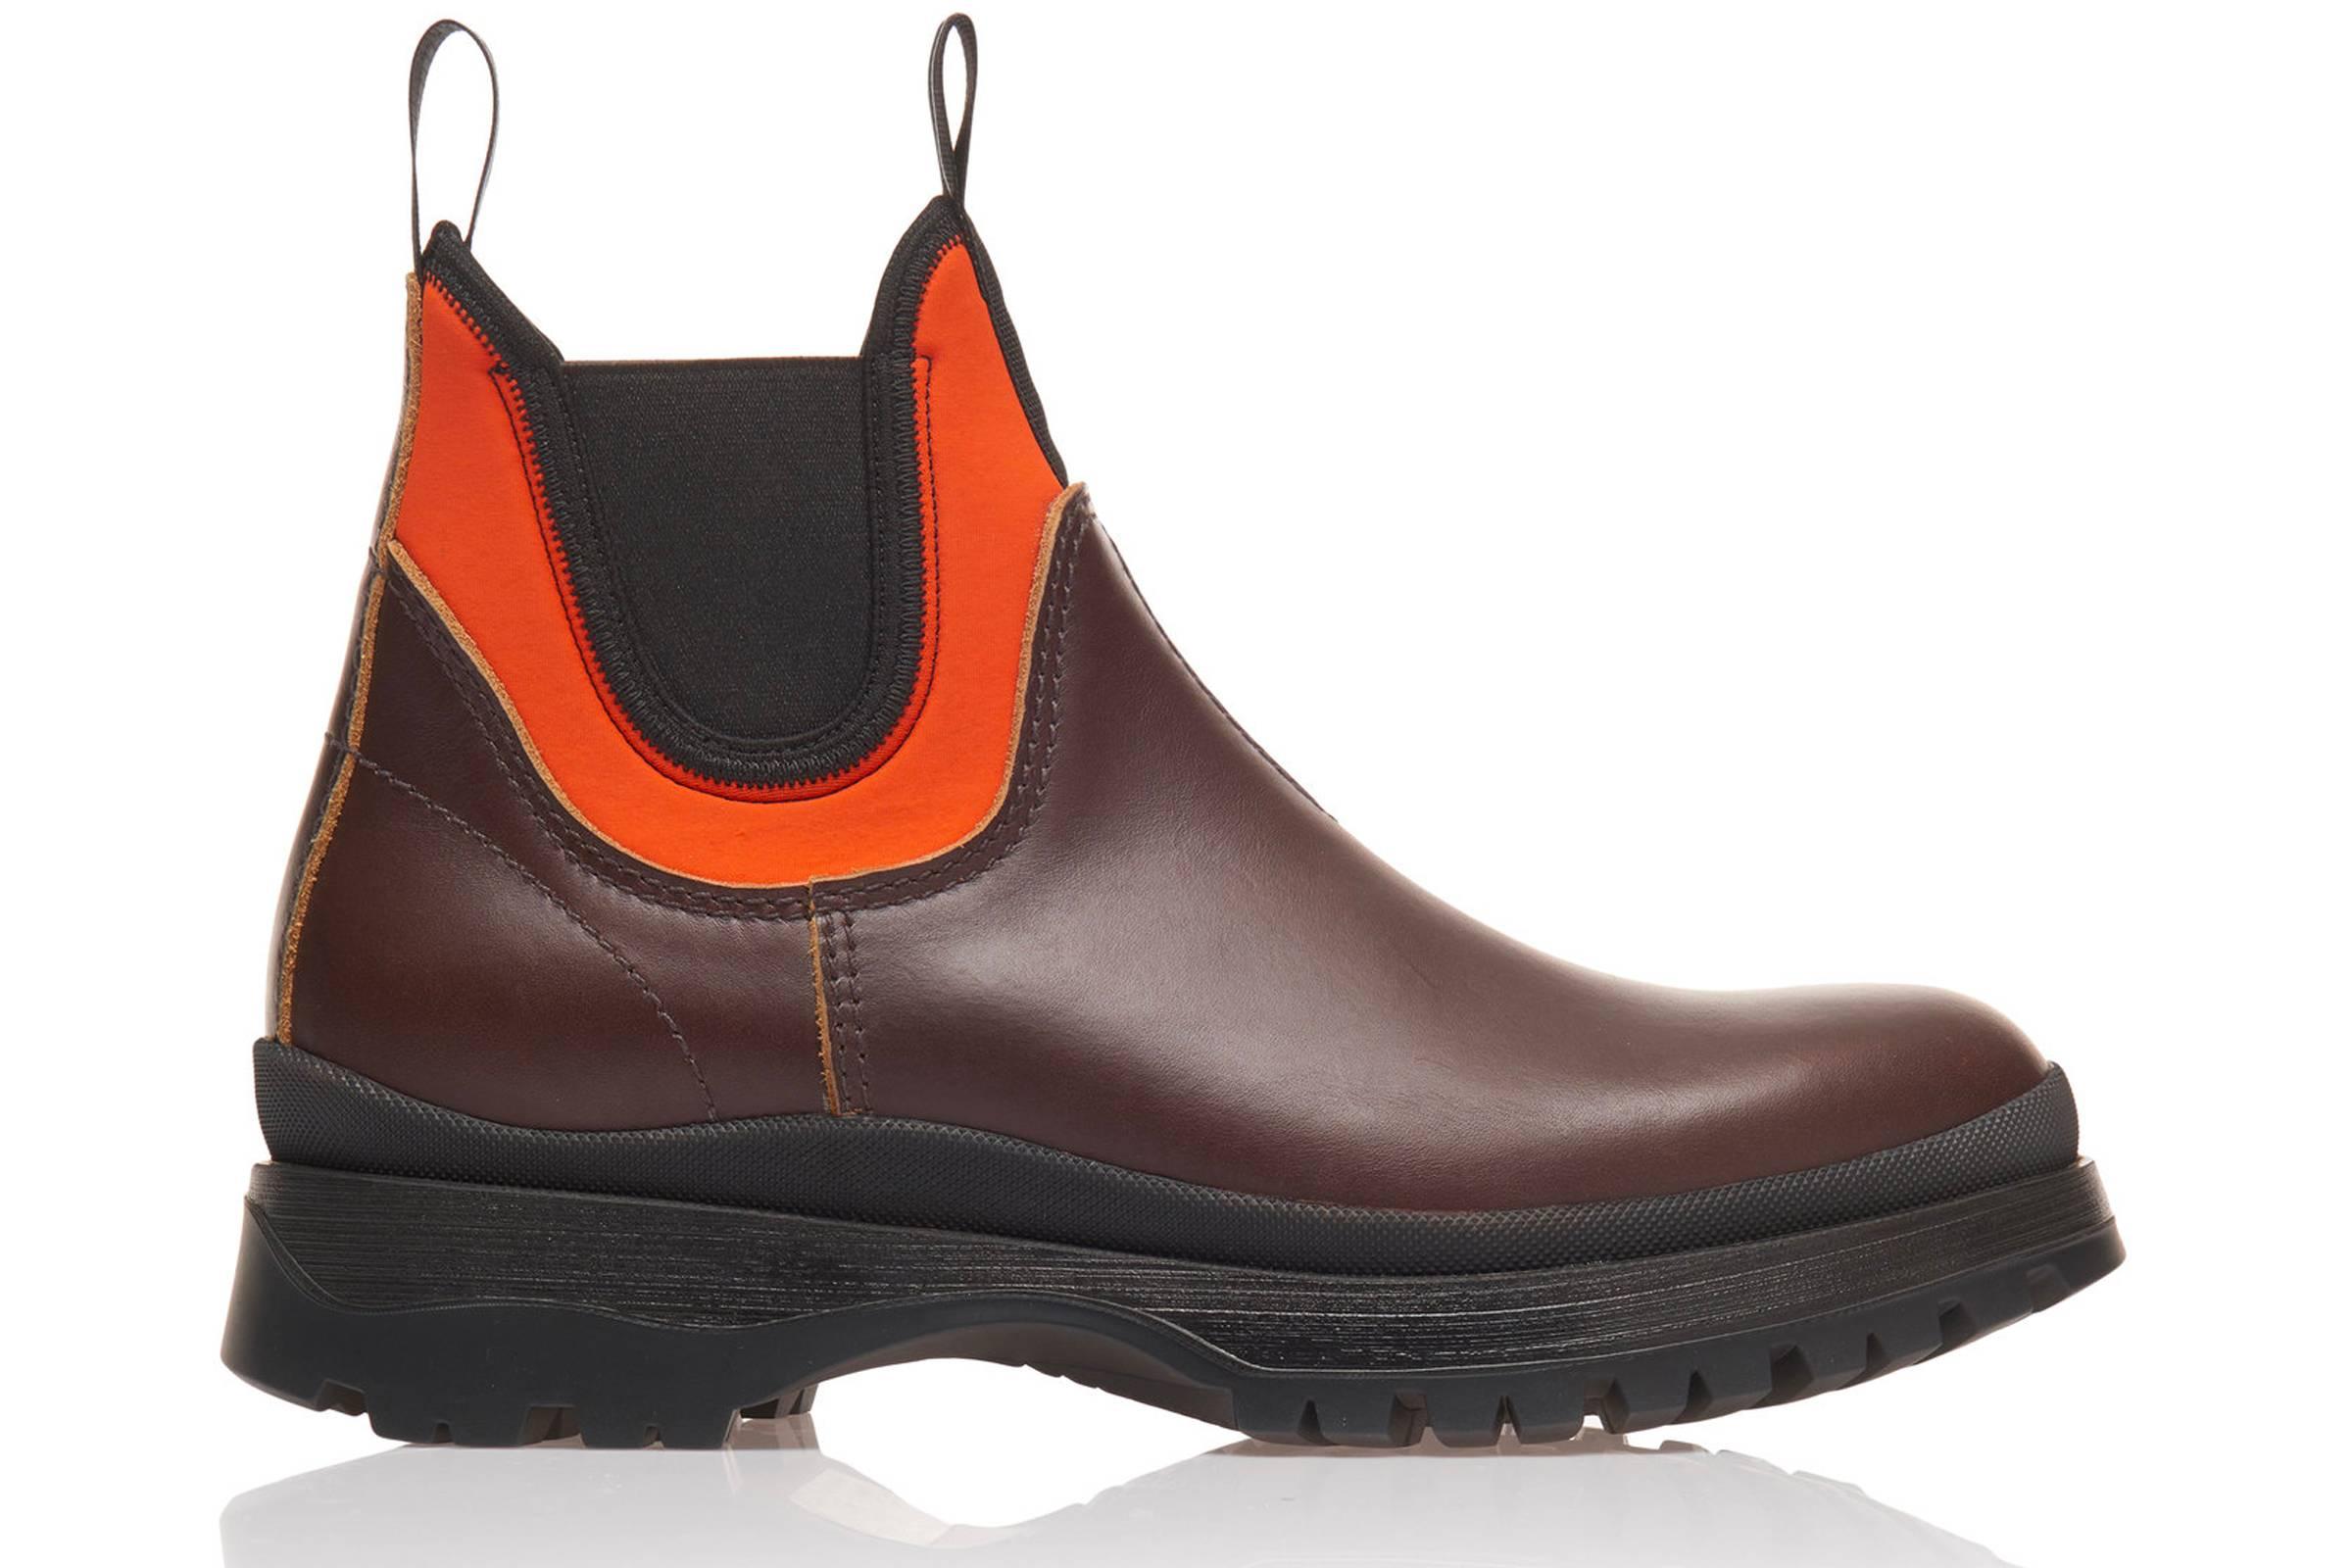 Prada Brixxen Leather and Neoprene Bootie